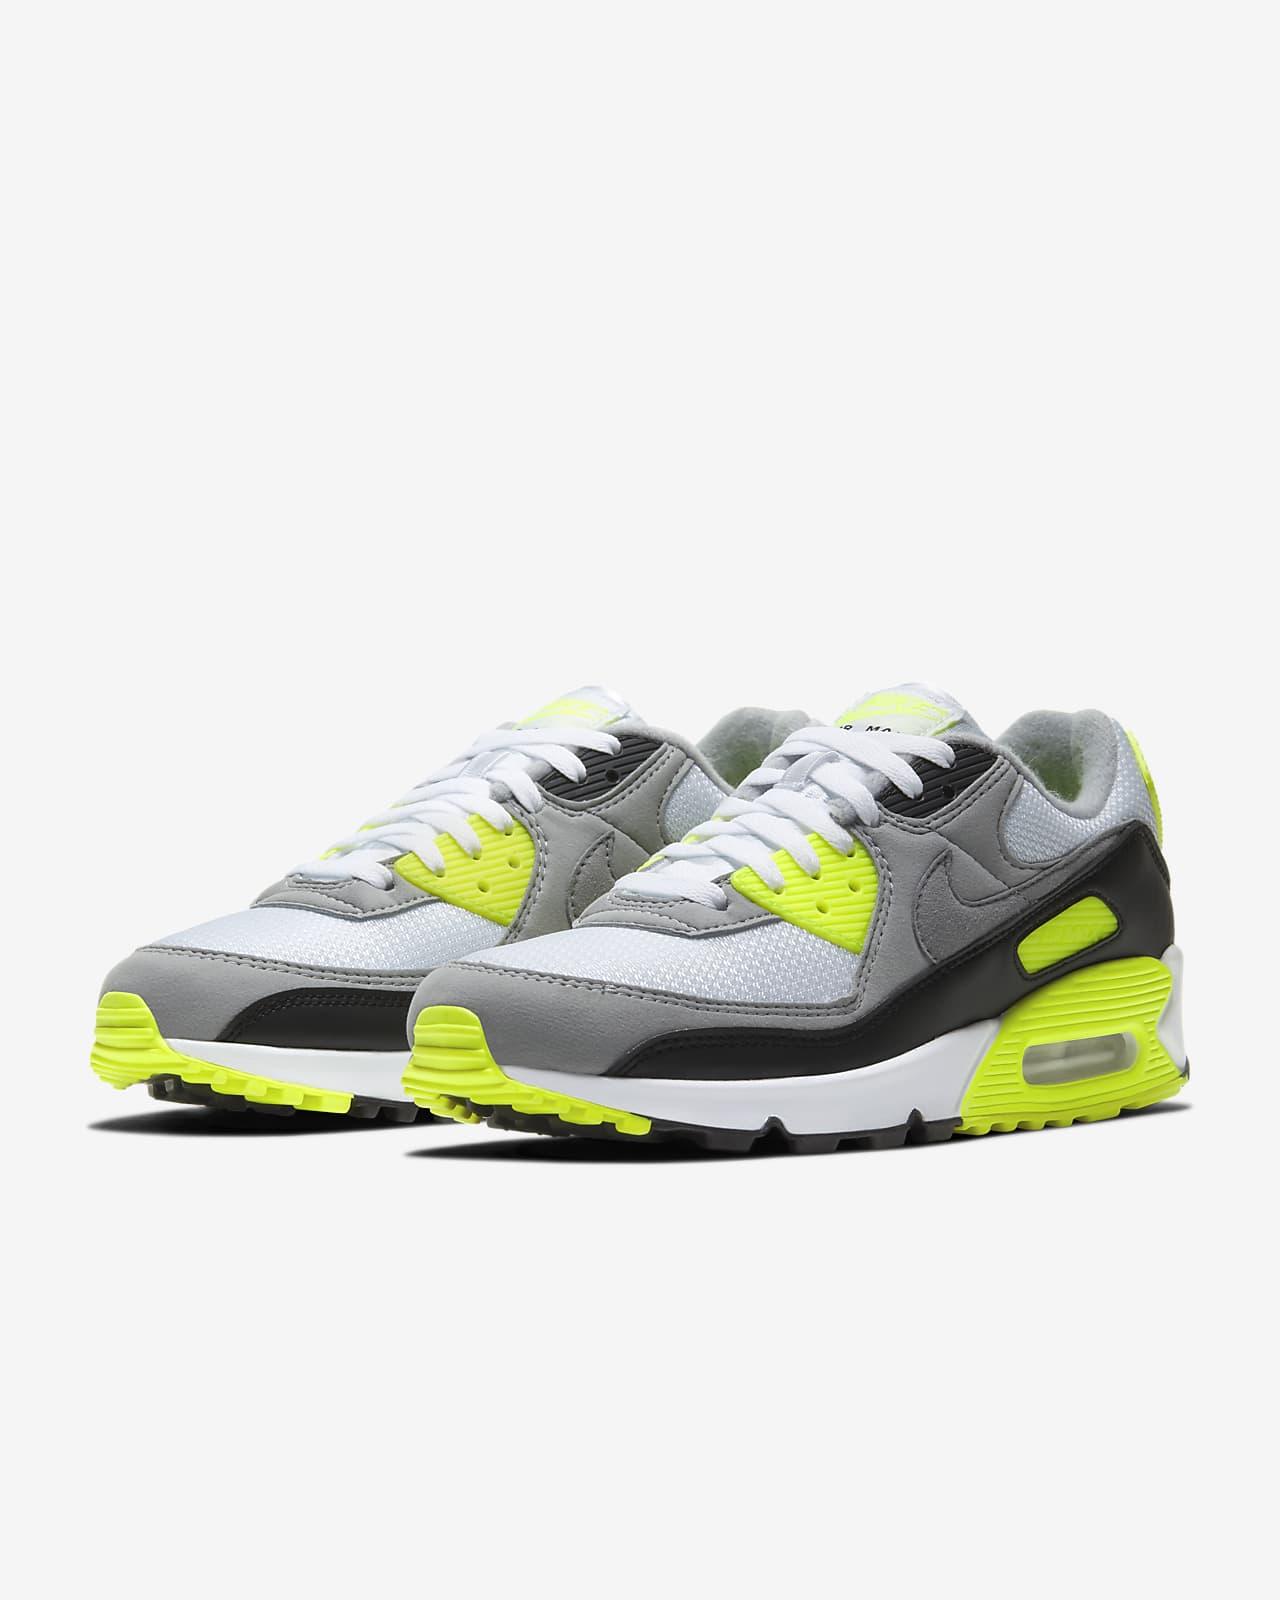 Nike Air Max 90 Men's Shoe. Nike SA